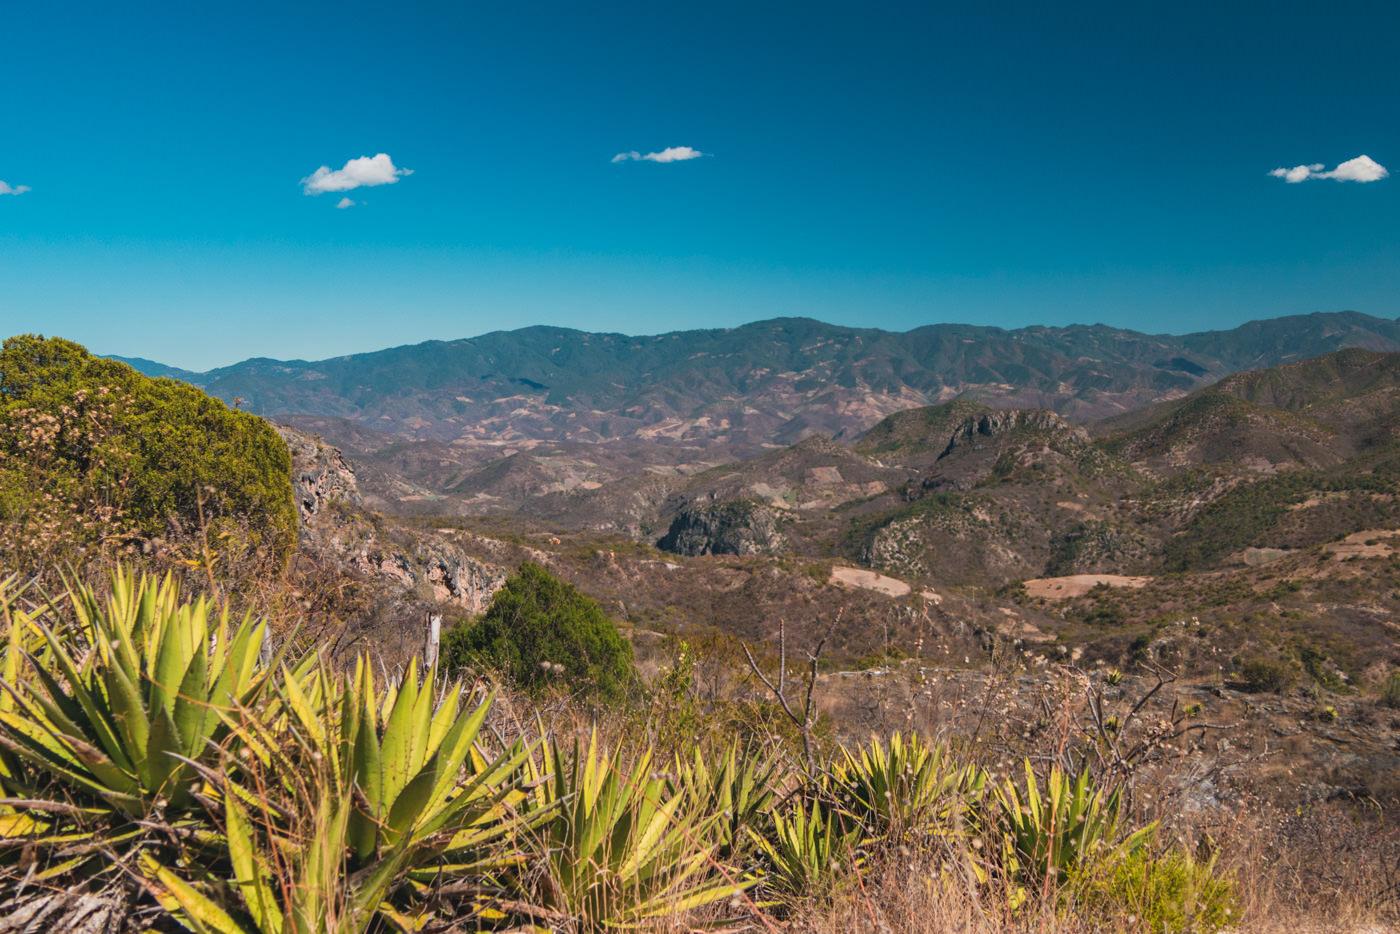 Ein Blick ins Tal beim Hierve el Agua - Oaxaca, Mexiko